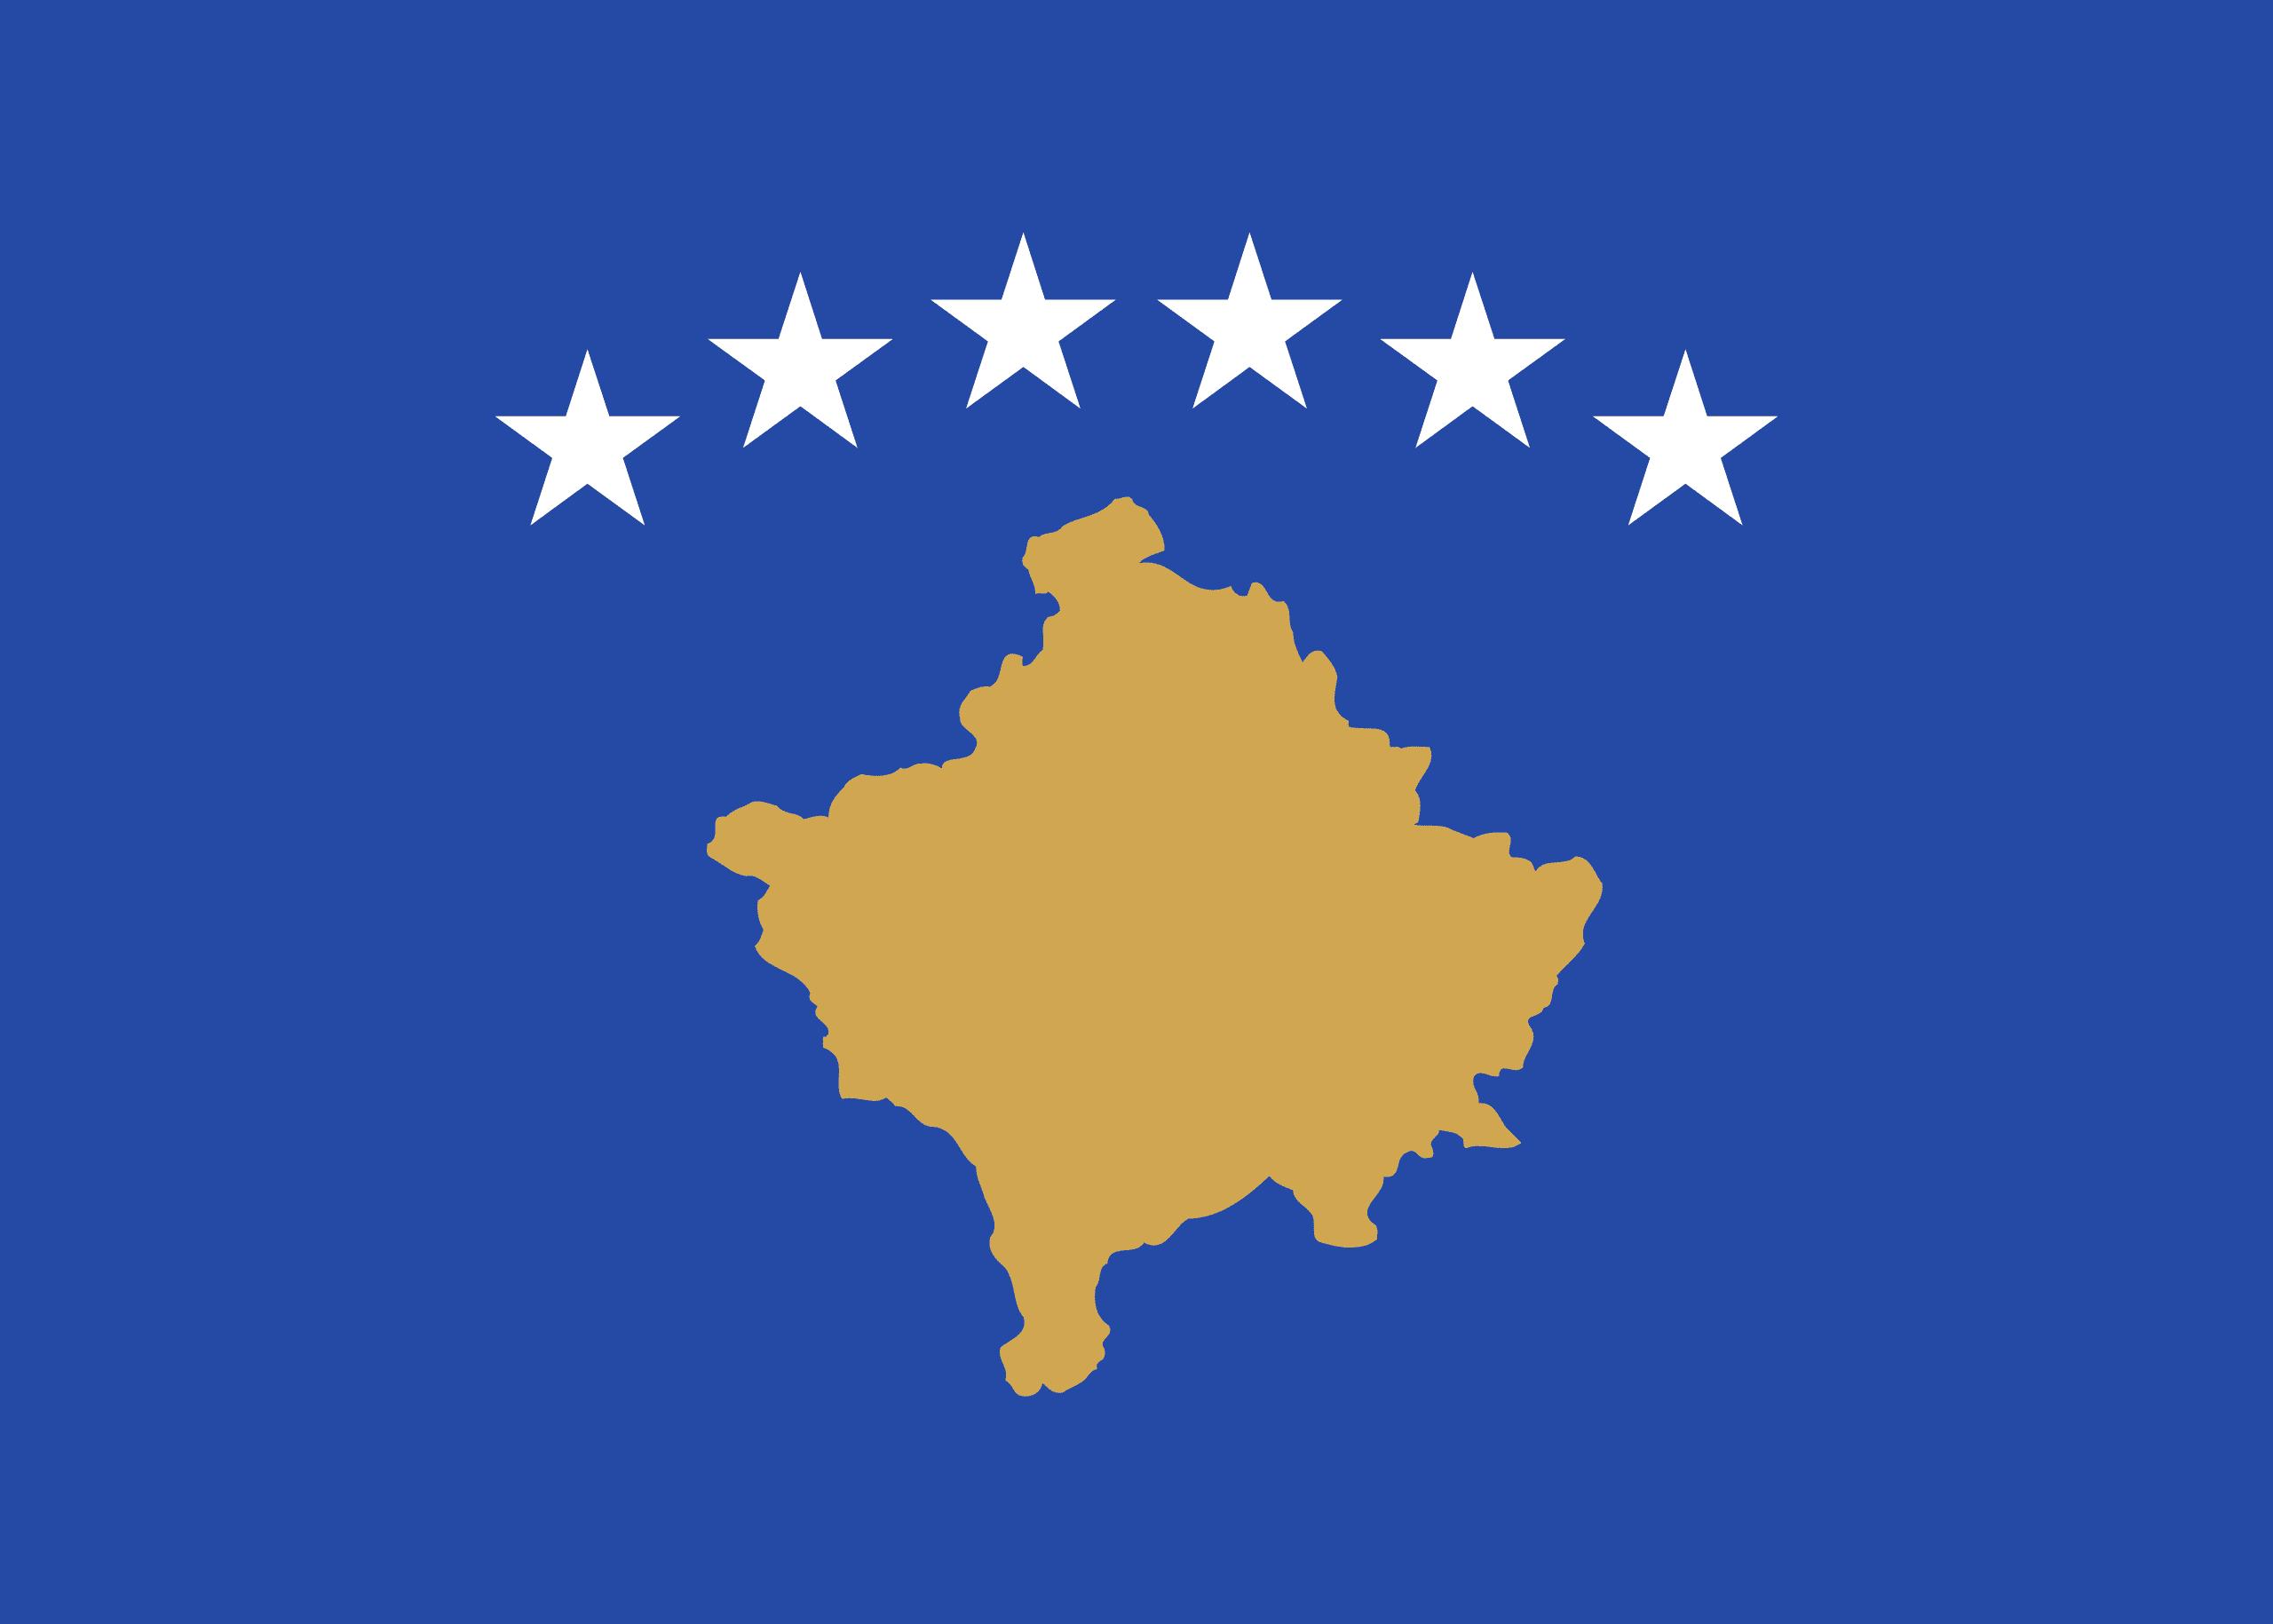 kosovo flags of countries